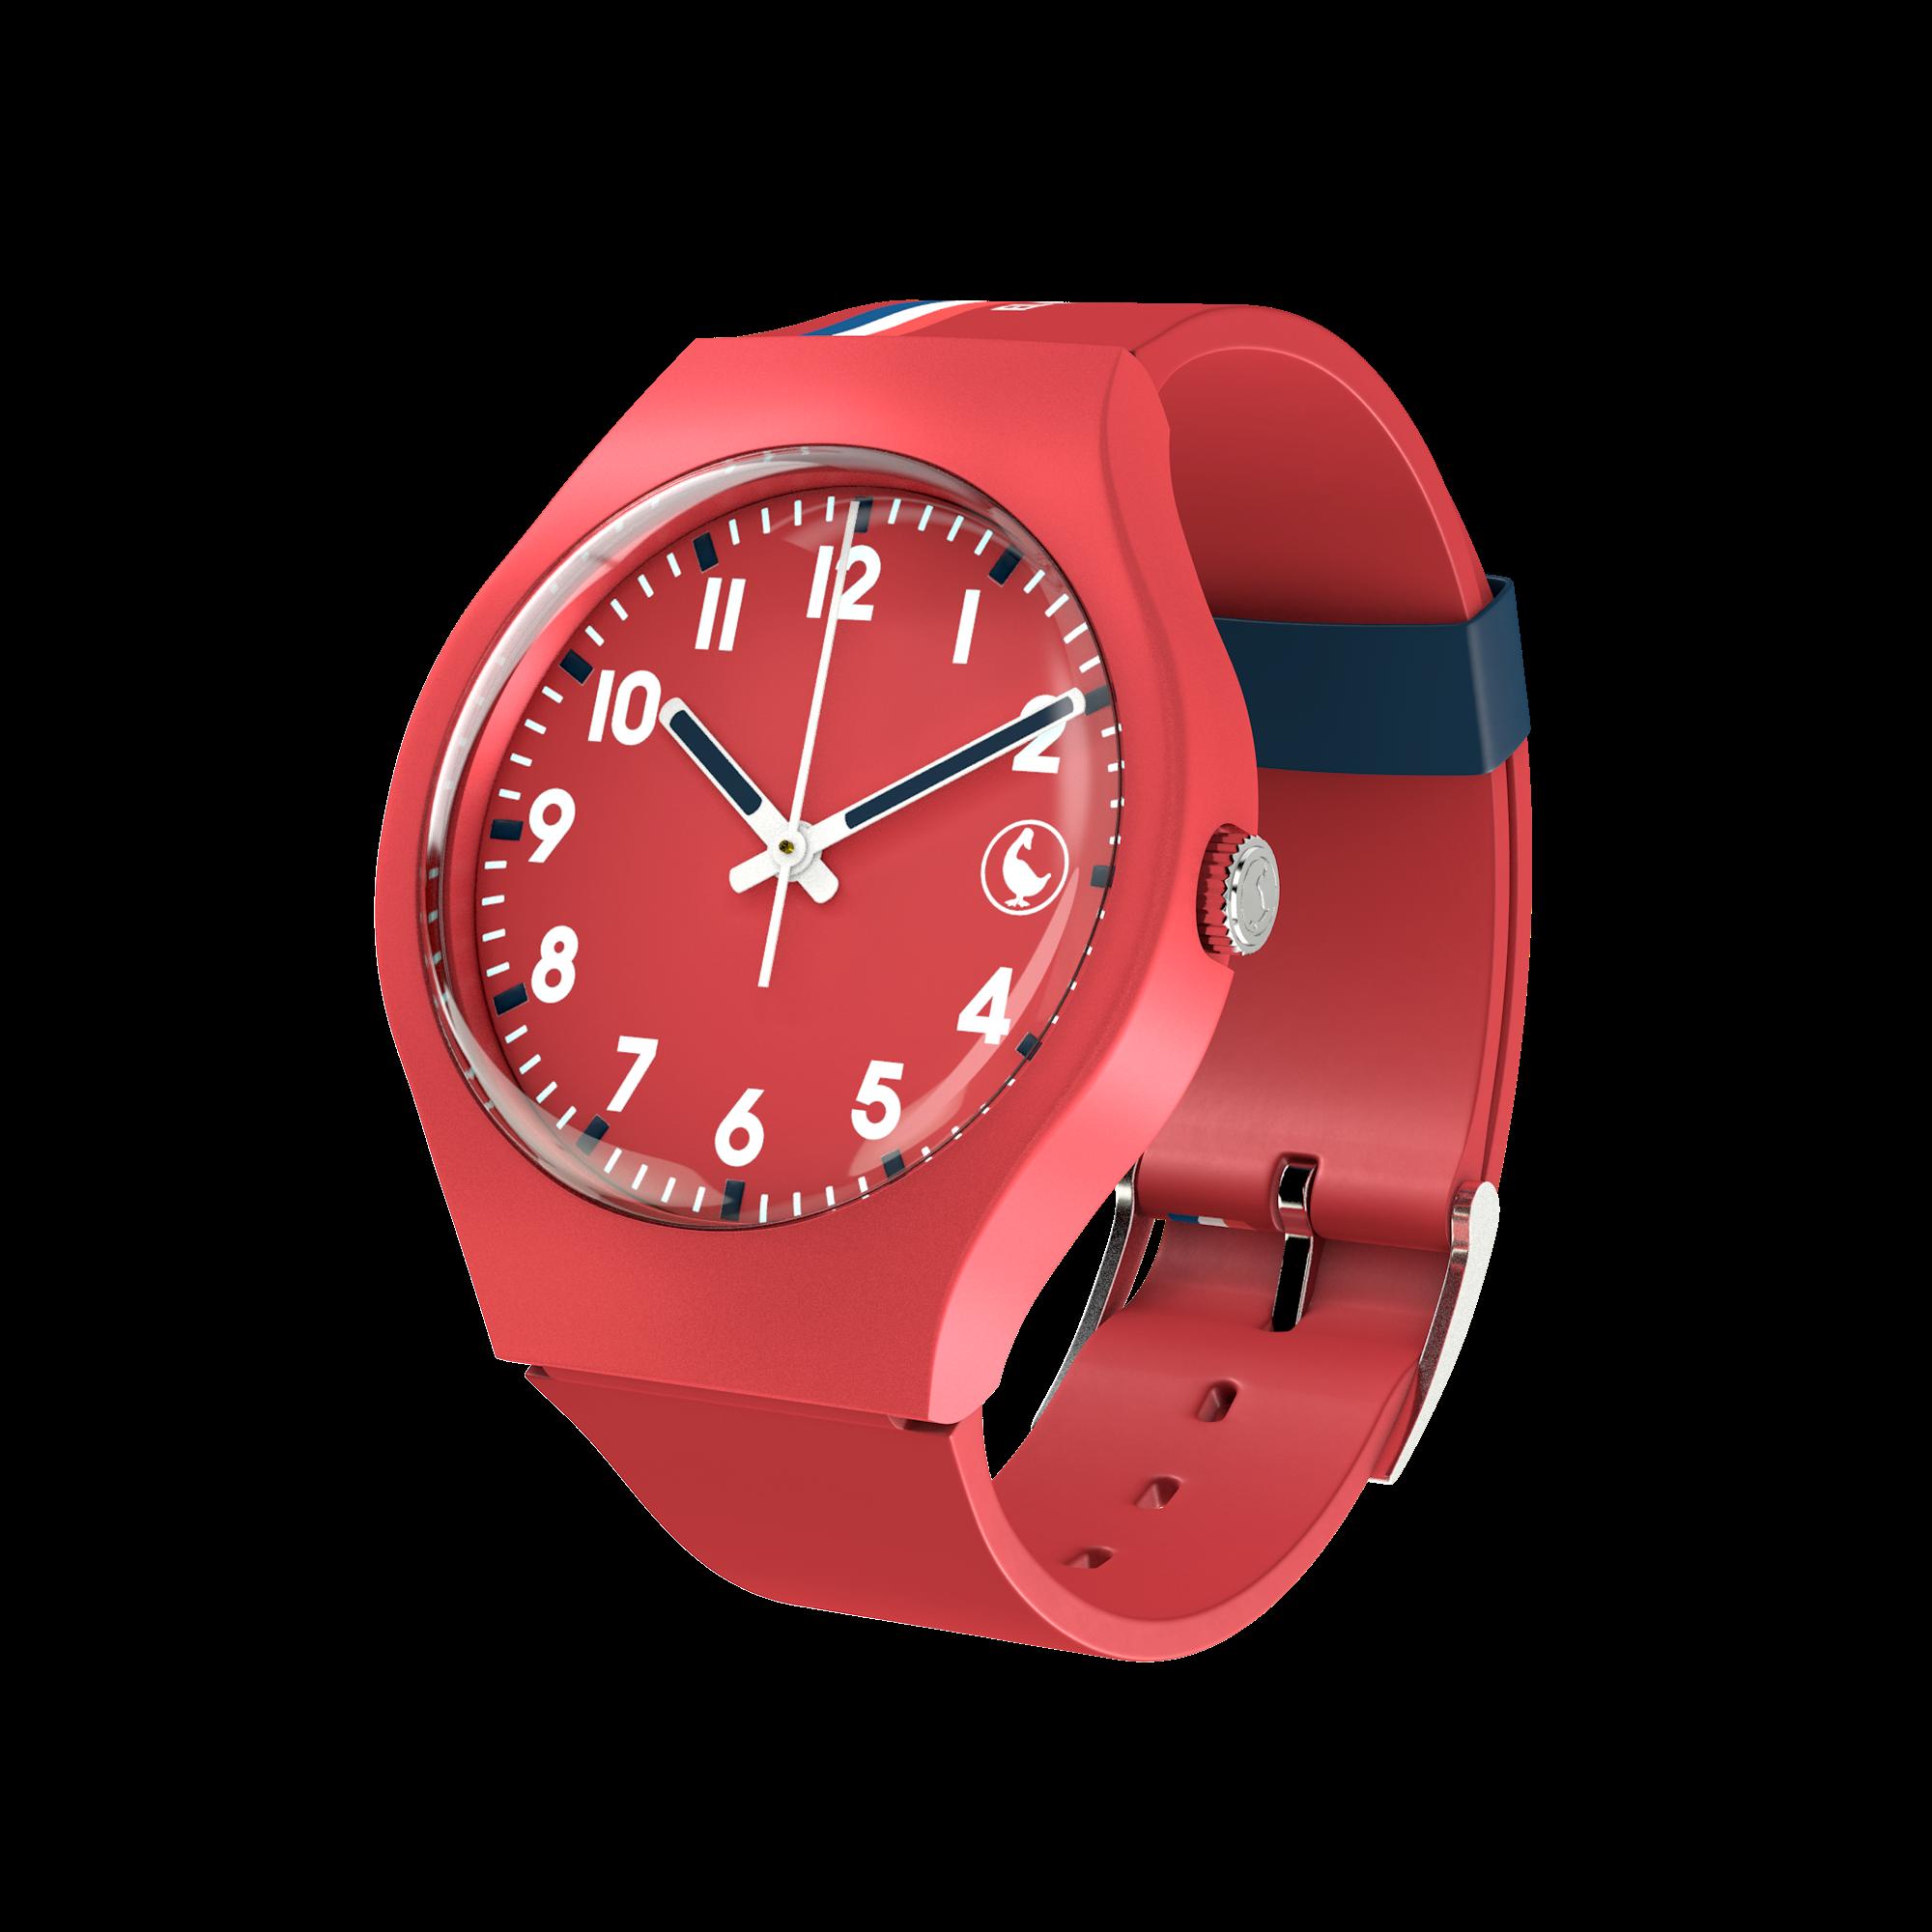 Reloj Ganso Rojo Image 2